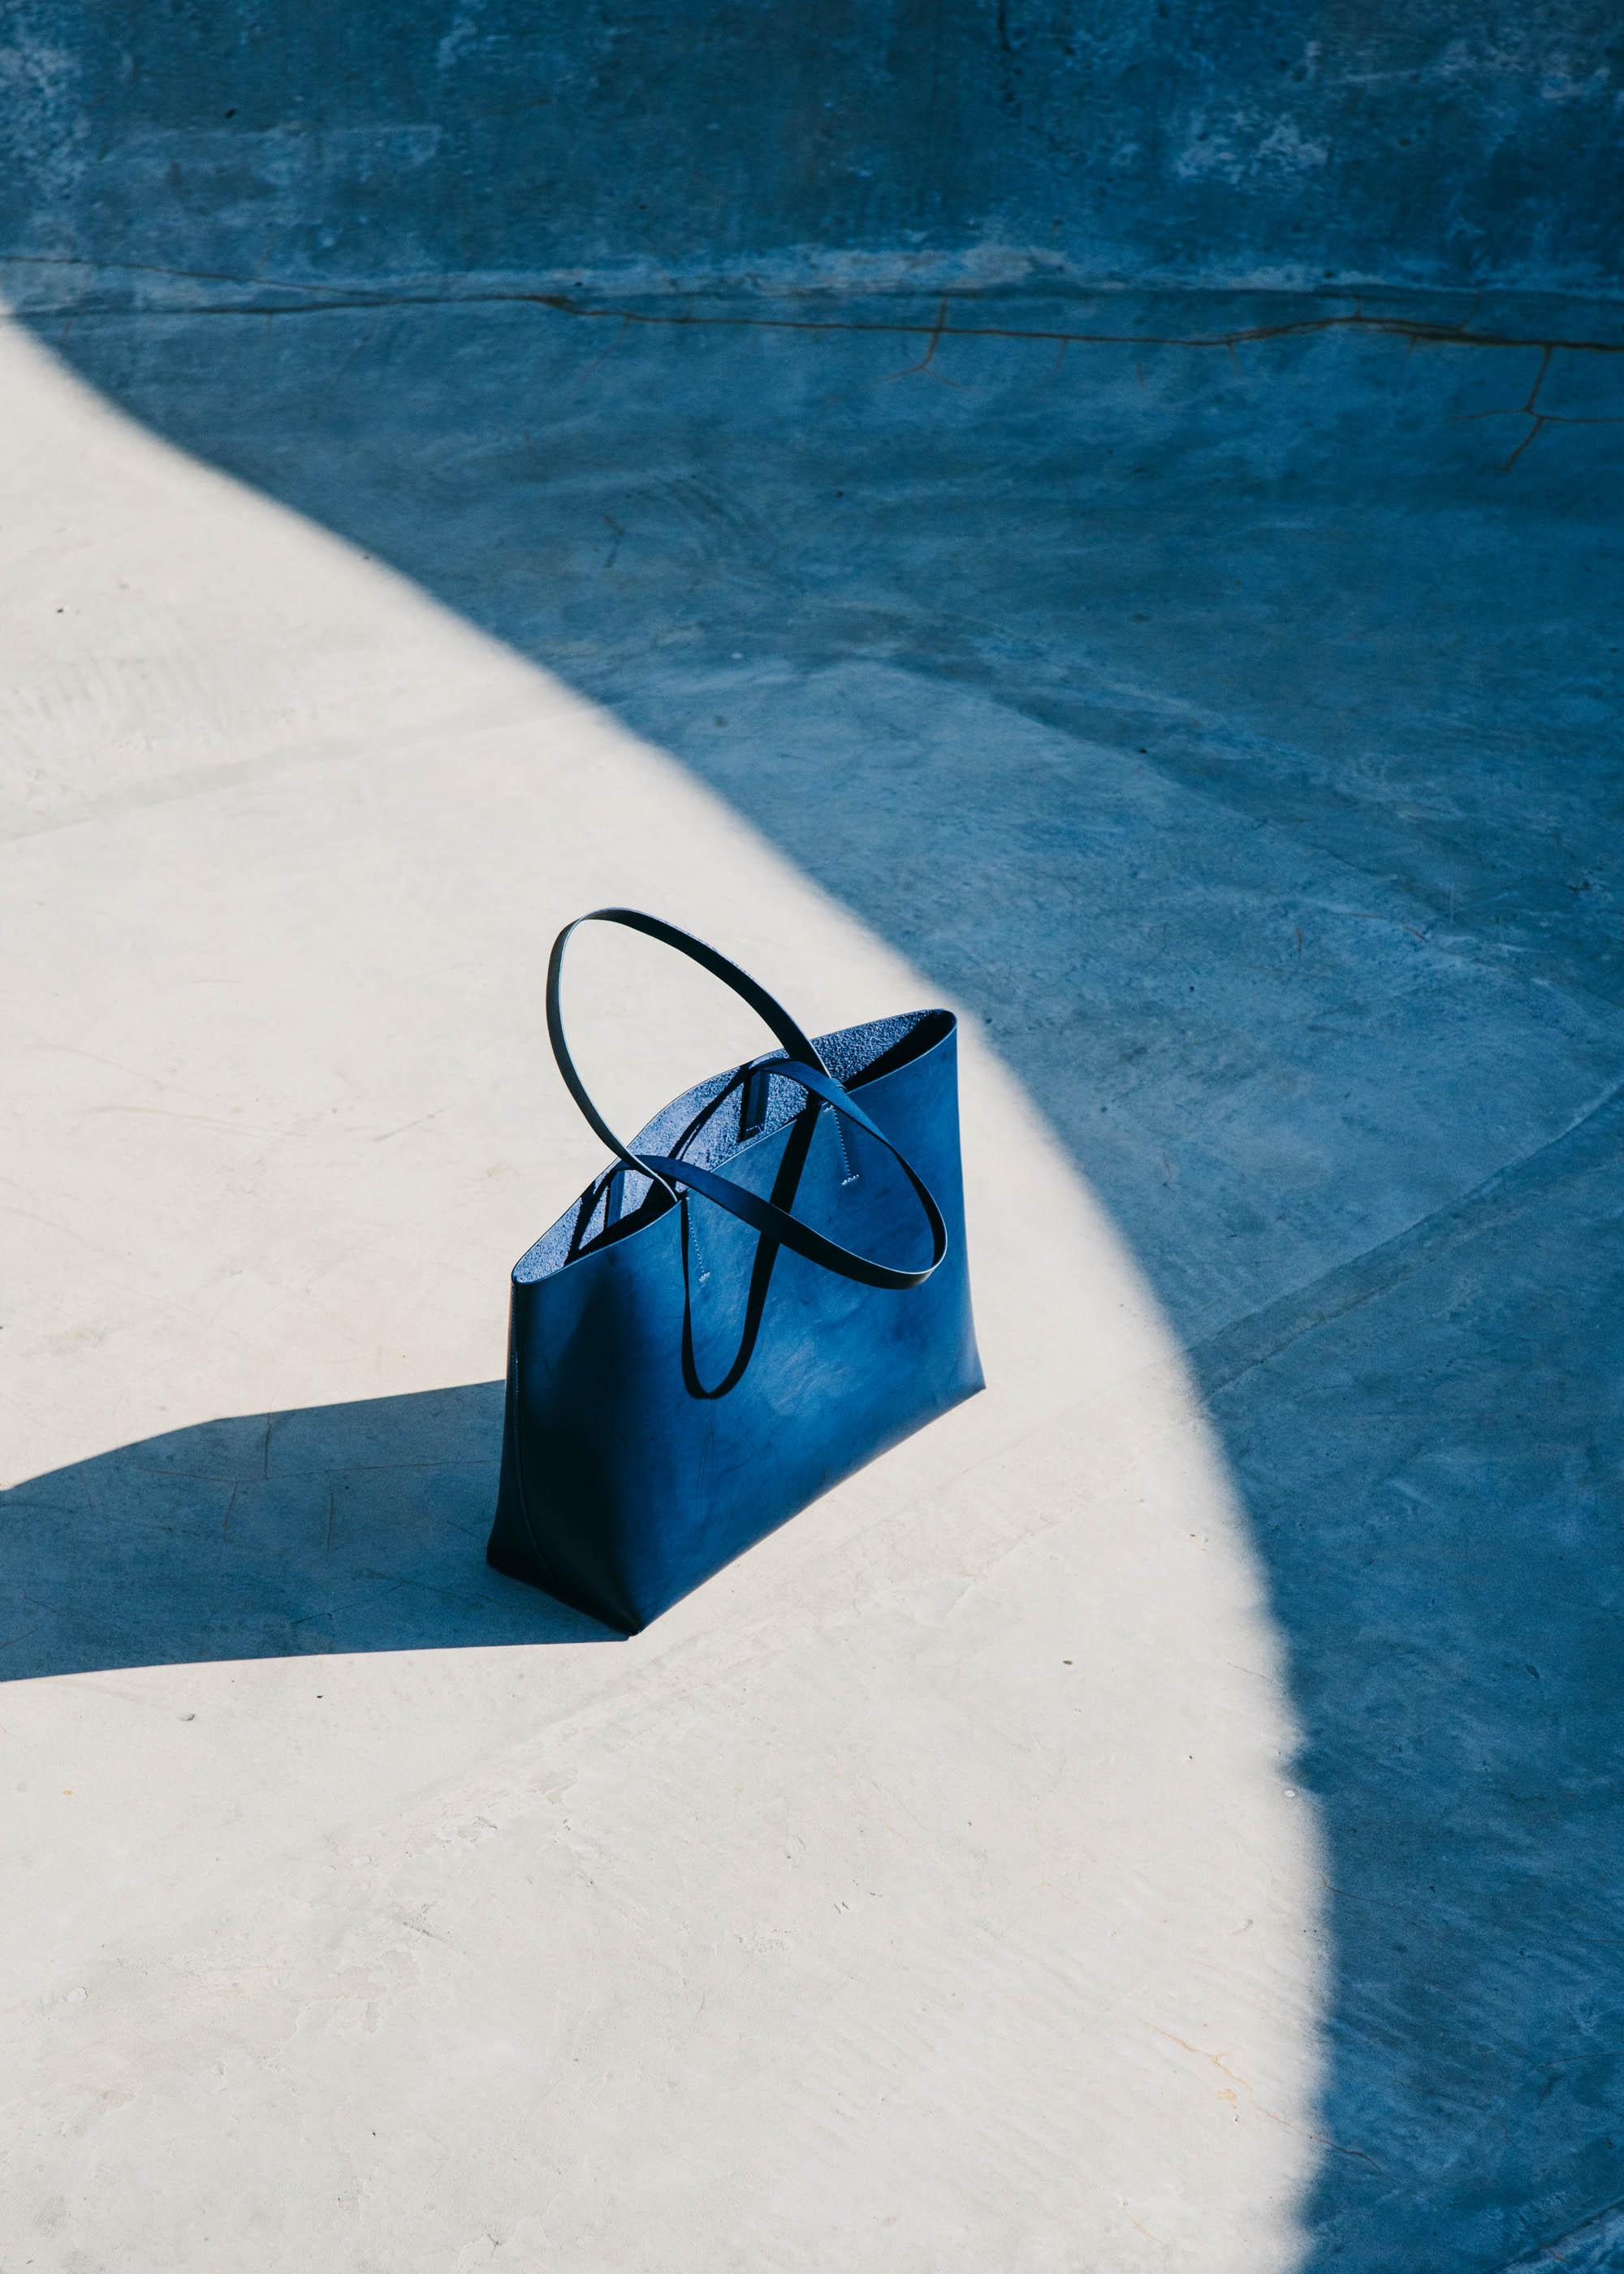 #loreak #mendian #basque #fashion #stilllife #blue